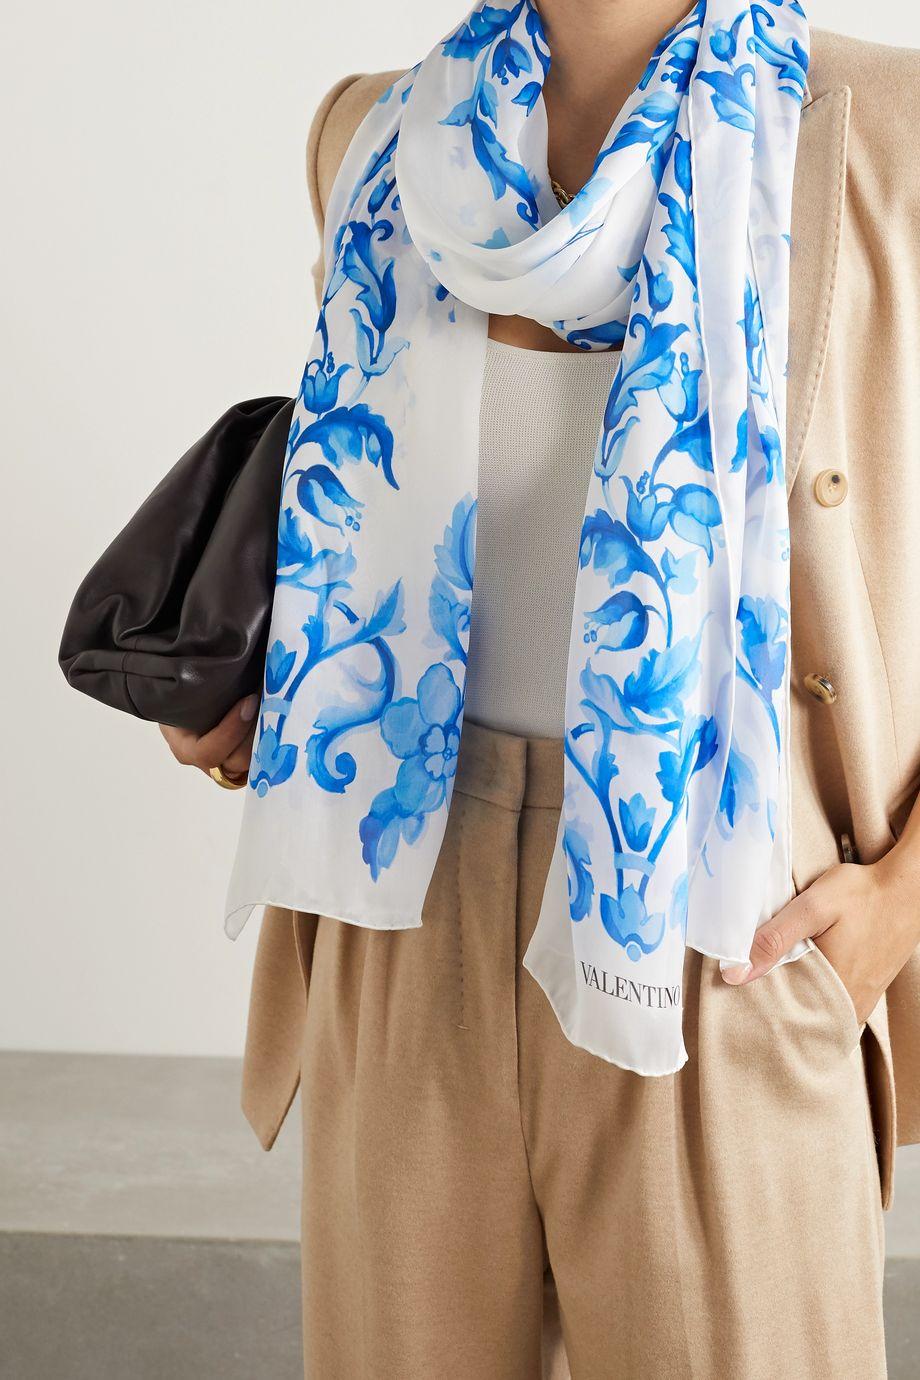 Valentino Valentino Garavani printed silk-chiffon scarf